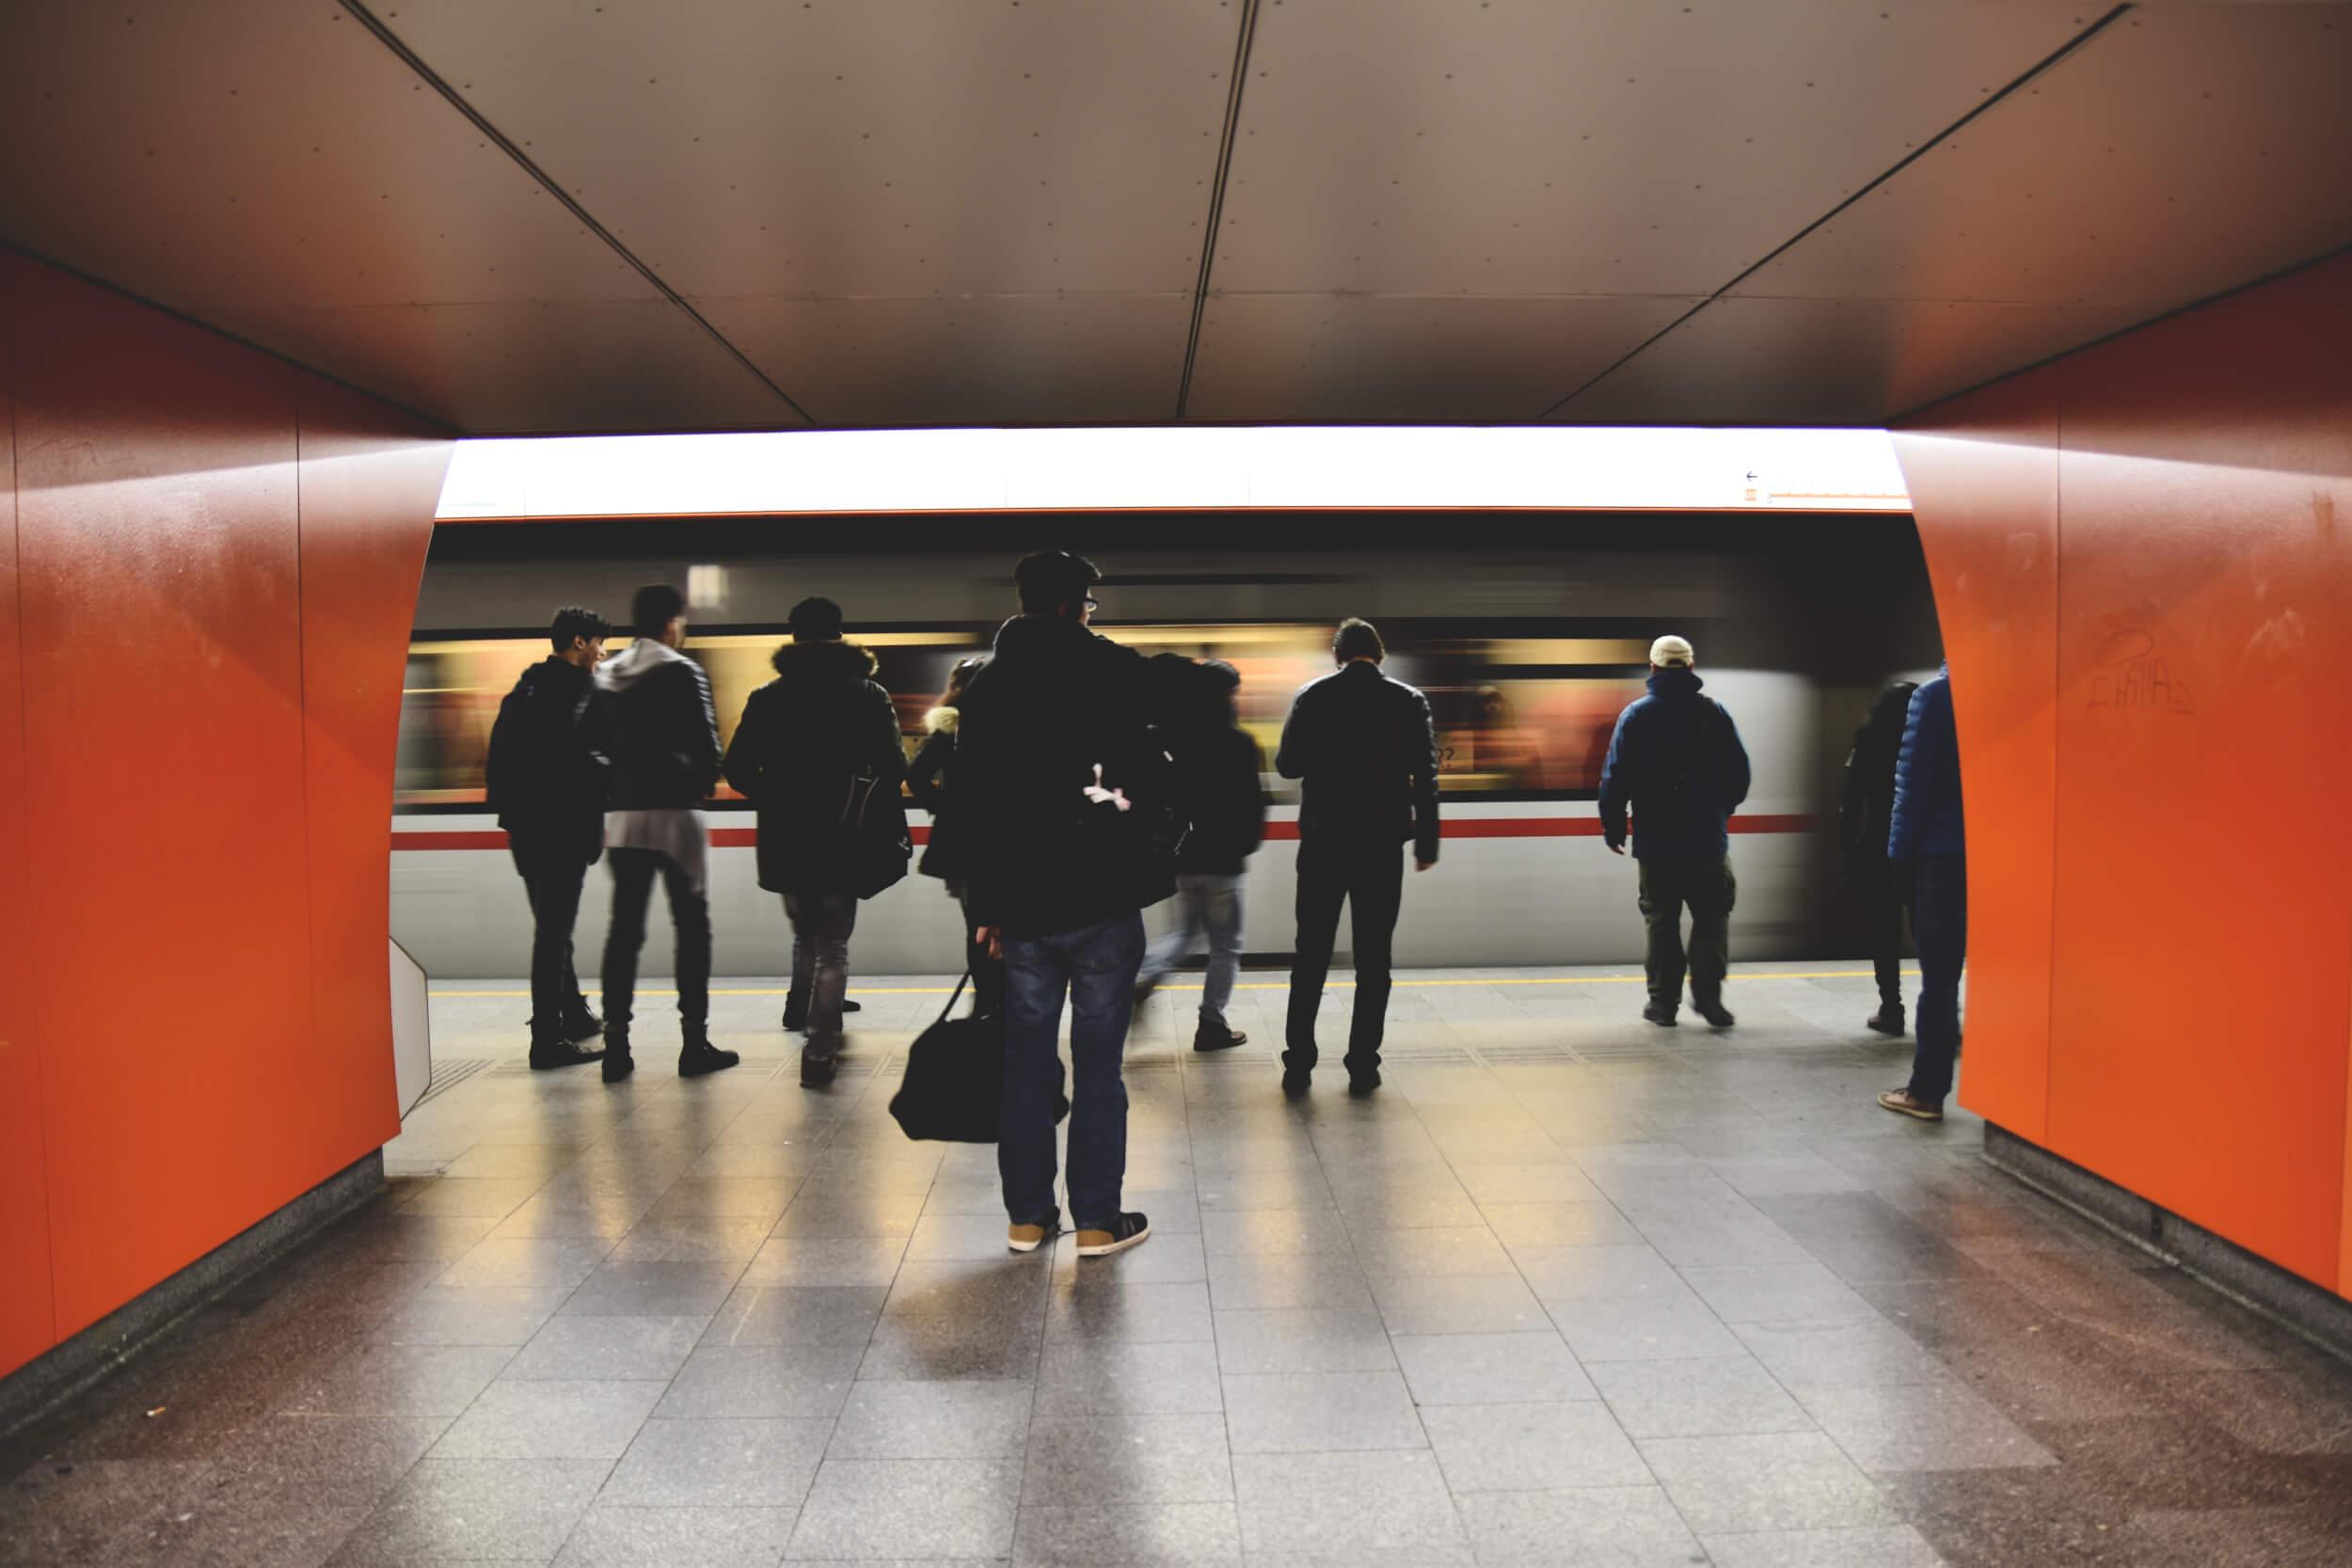 Rückkehrwillige Fachkräfte am Bahnhof (c) pexels / pixabay.de